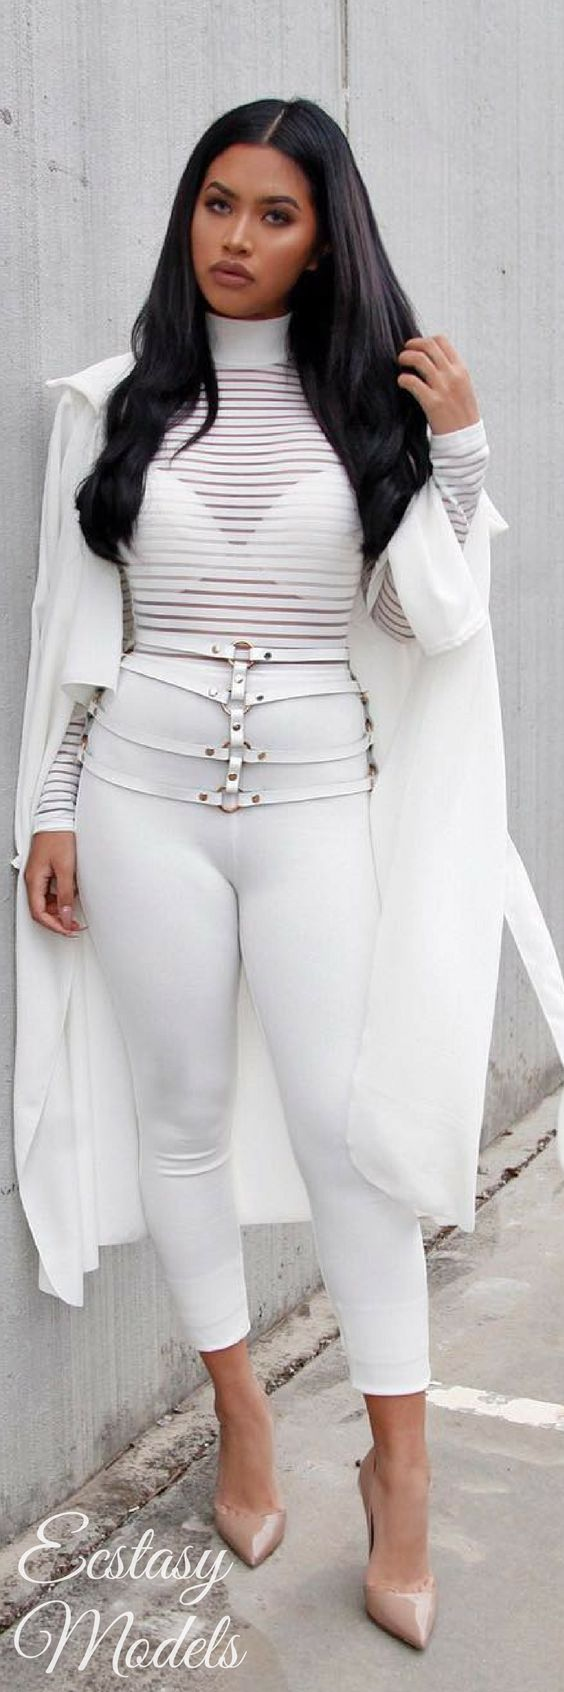 All White // Fashion Look by Stefney V.